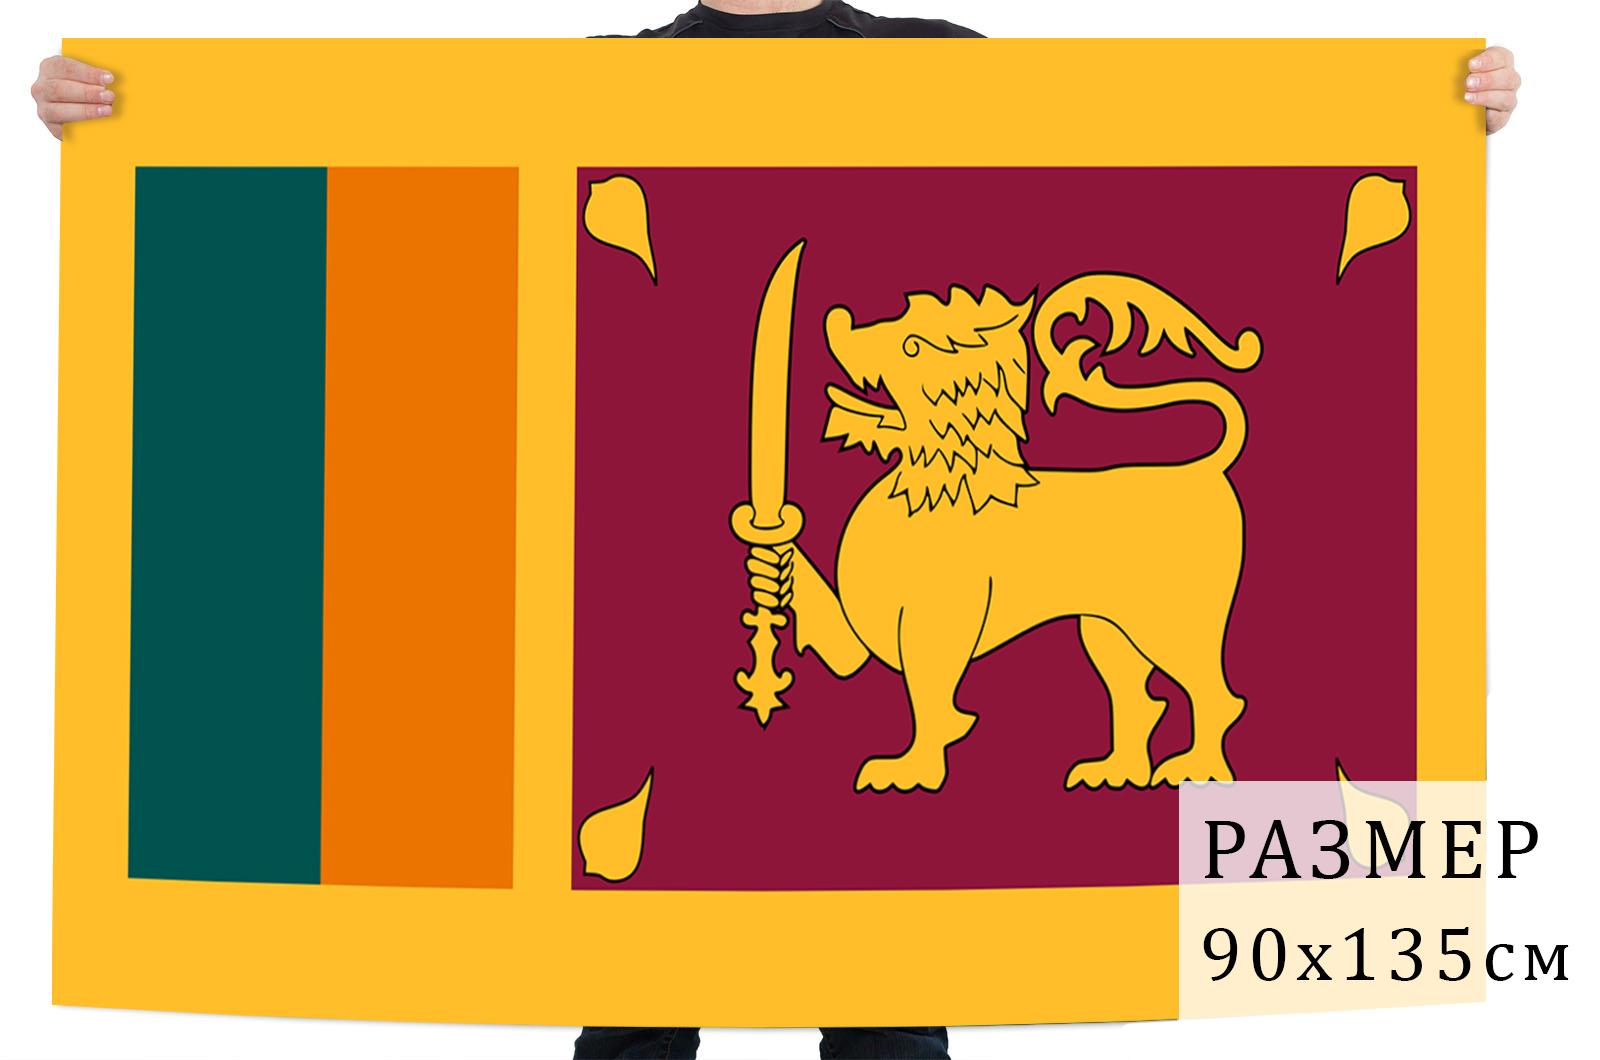 Флаг Шри-Ланки, купить флаг Шри-Ланки